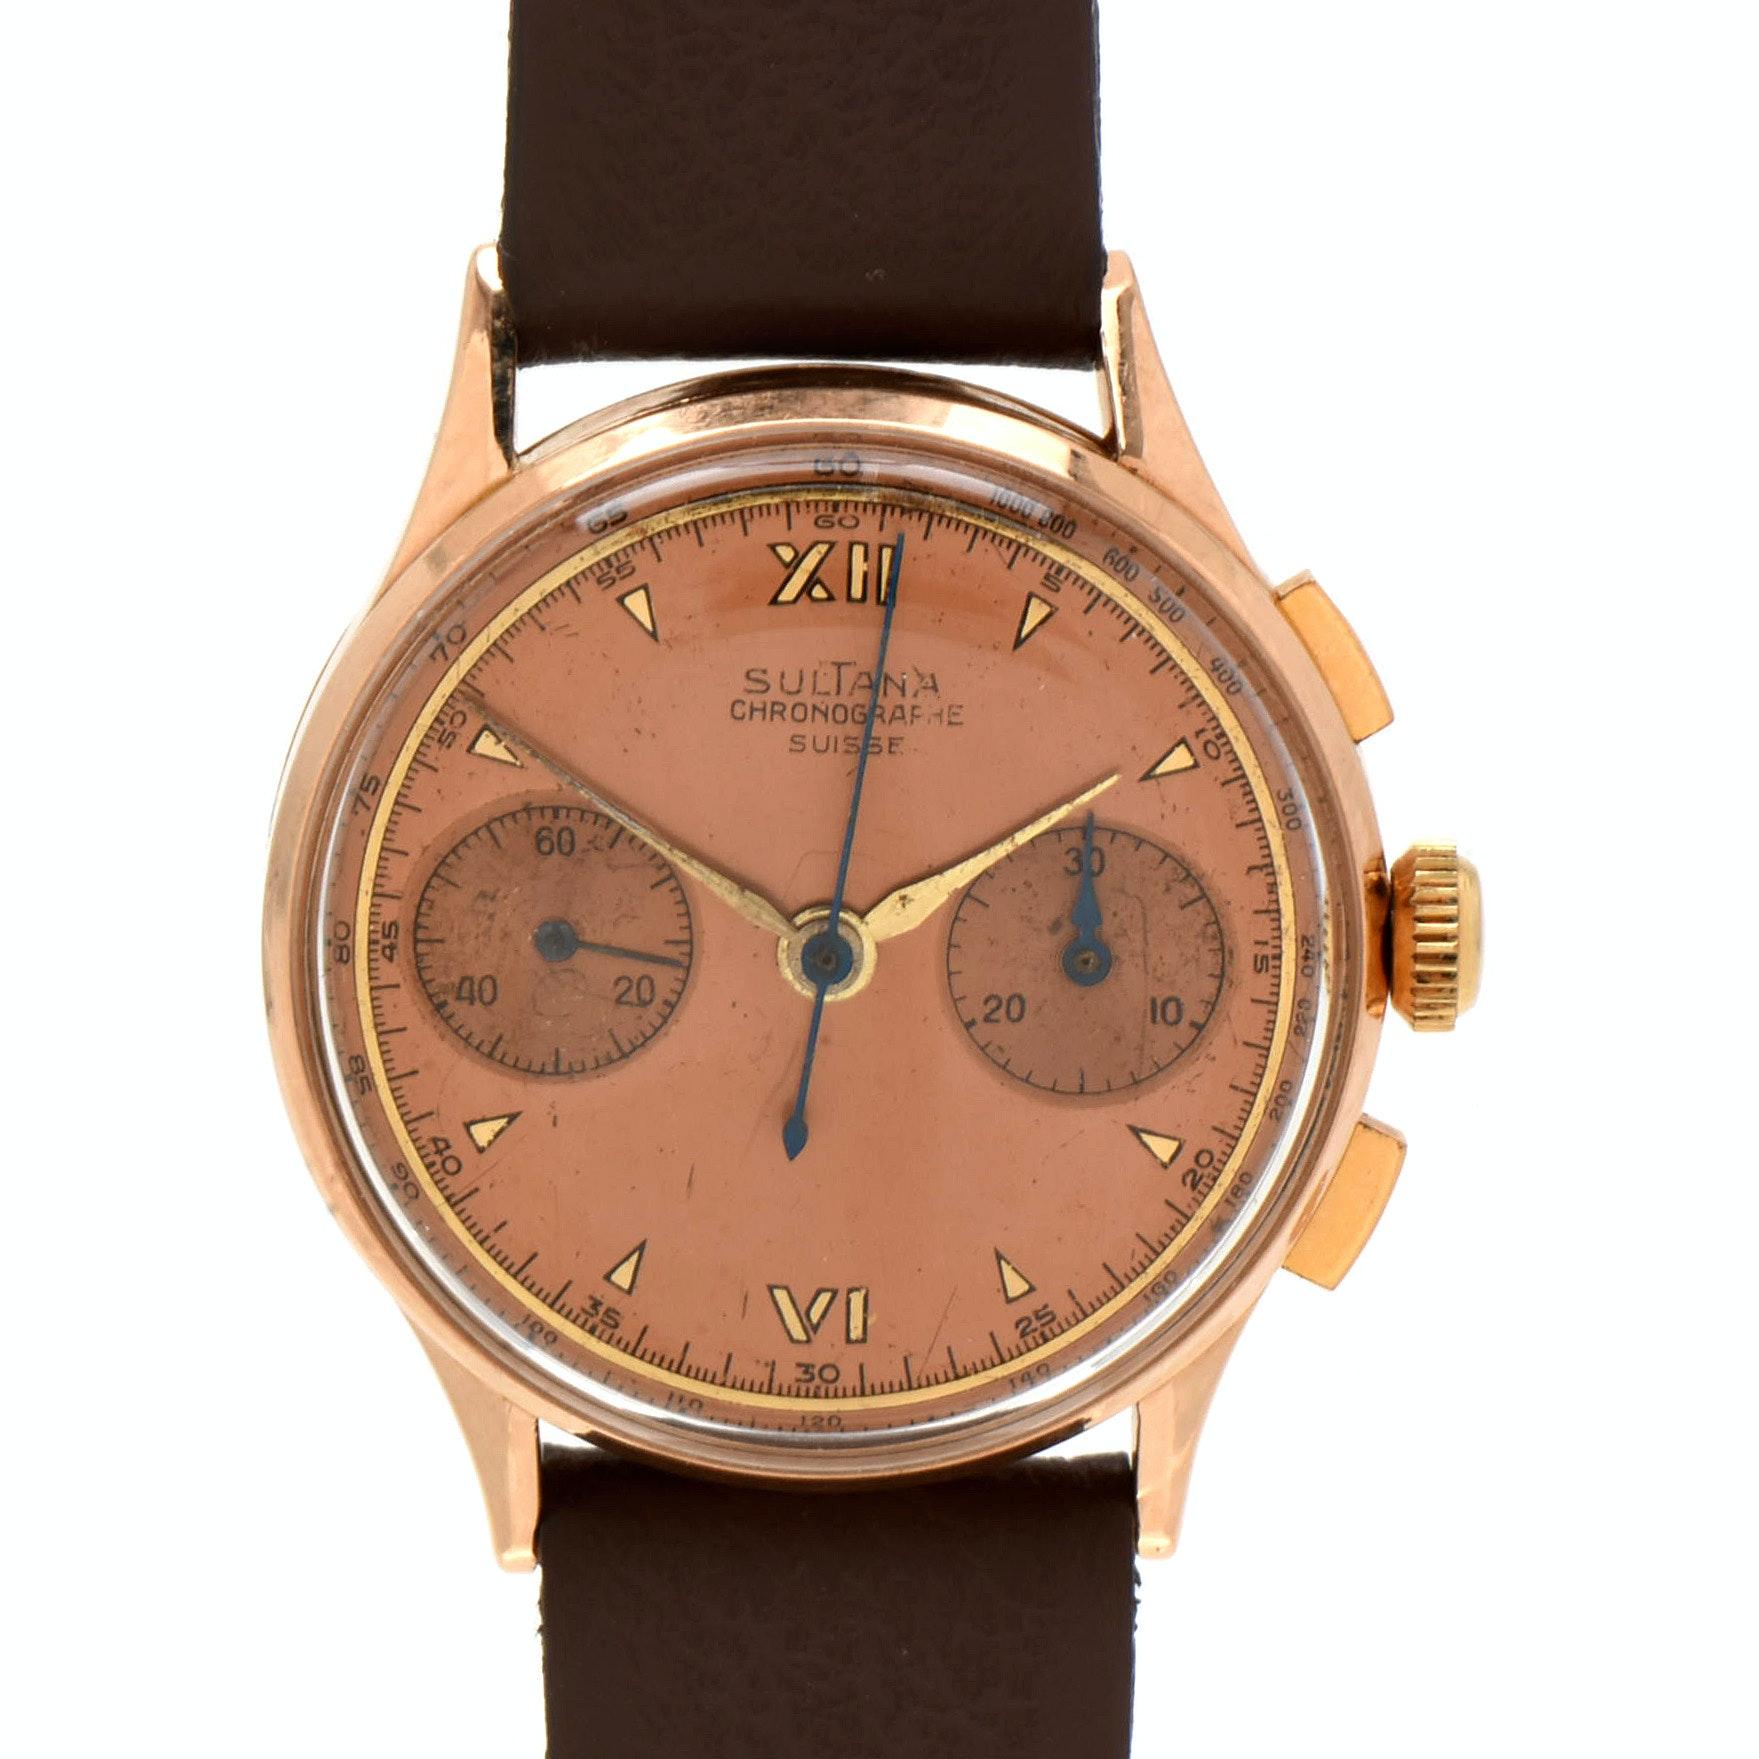 Vintage Chronographe Suisse Sultana 18K Rose Gold Wristwatch